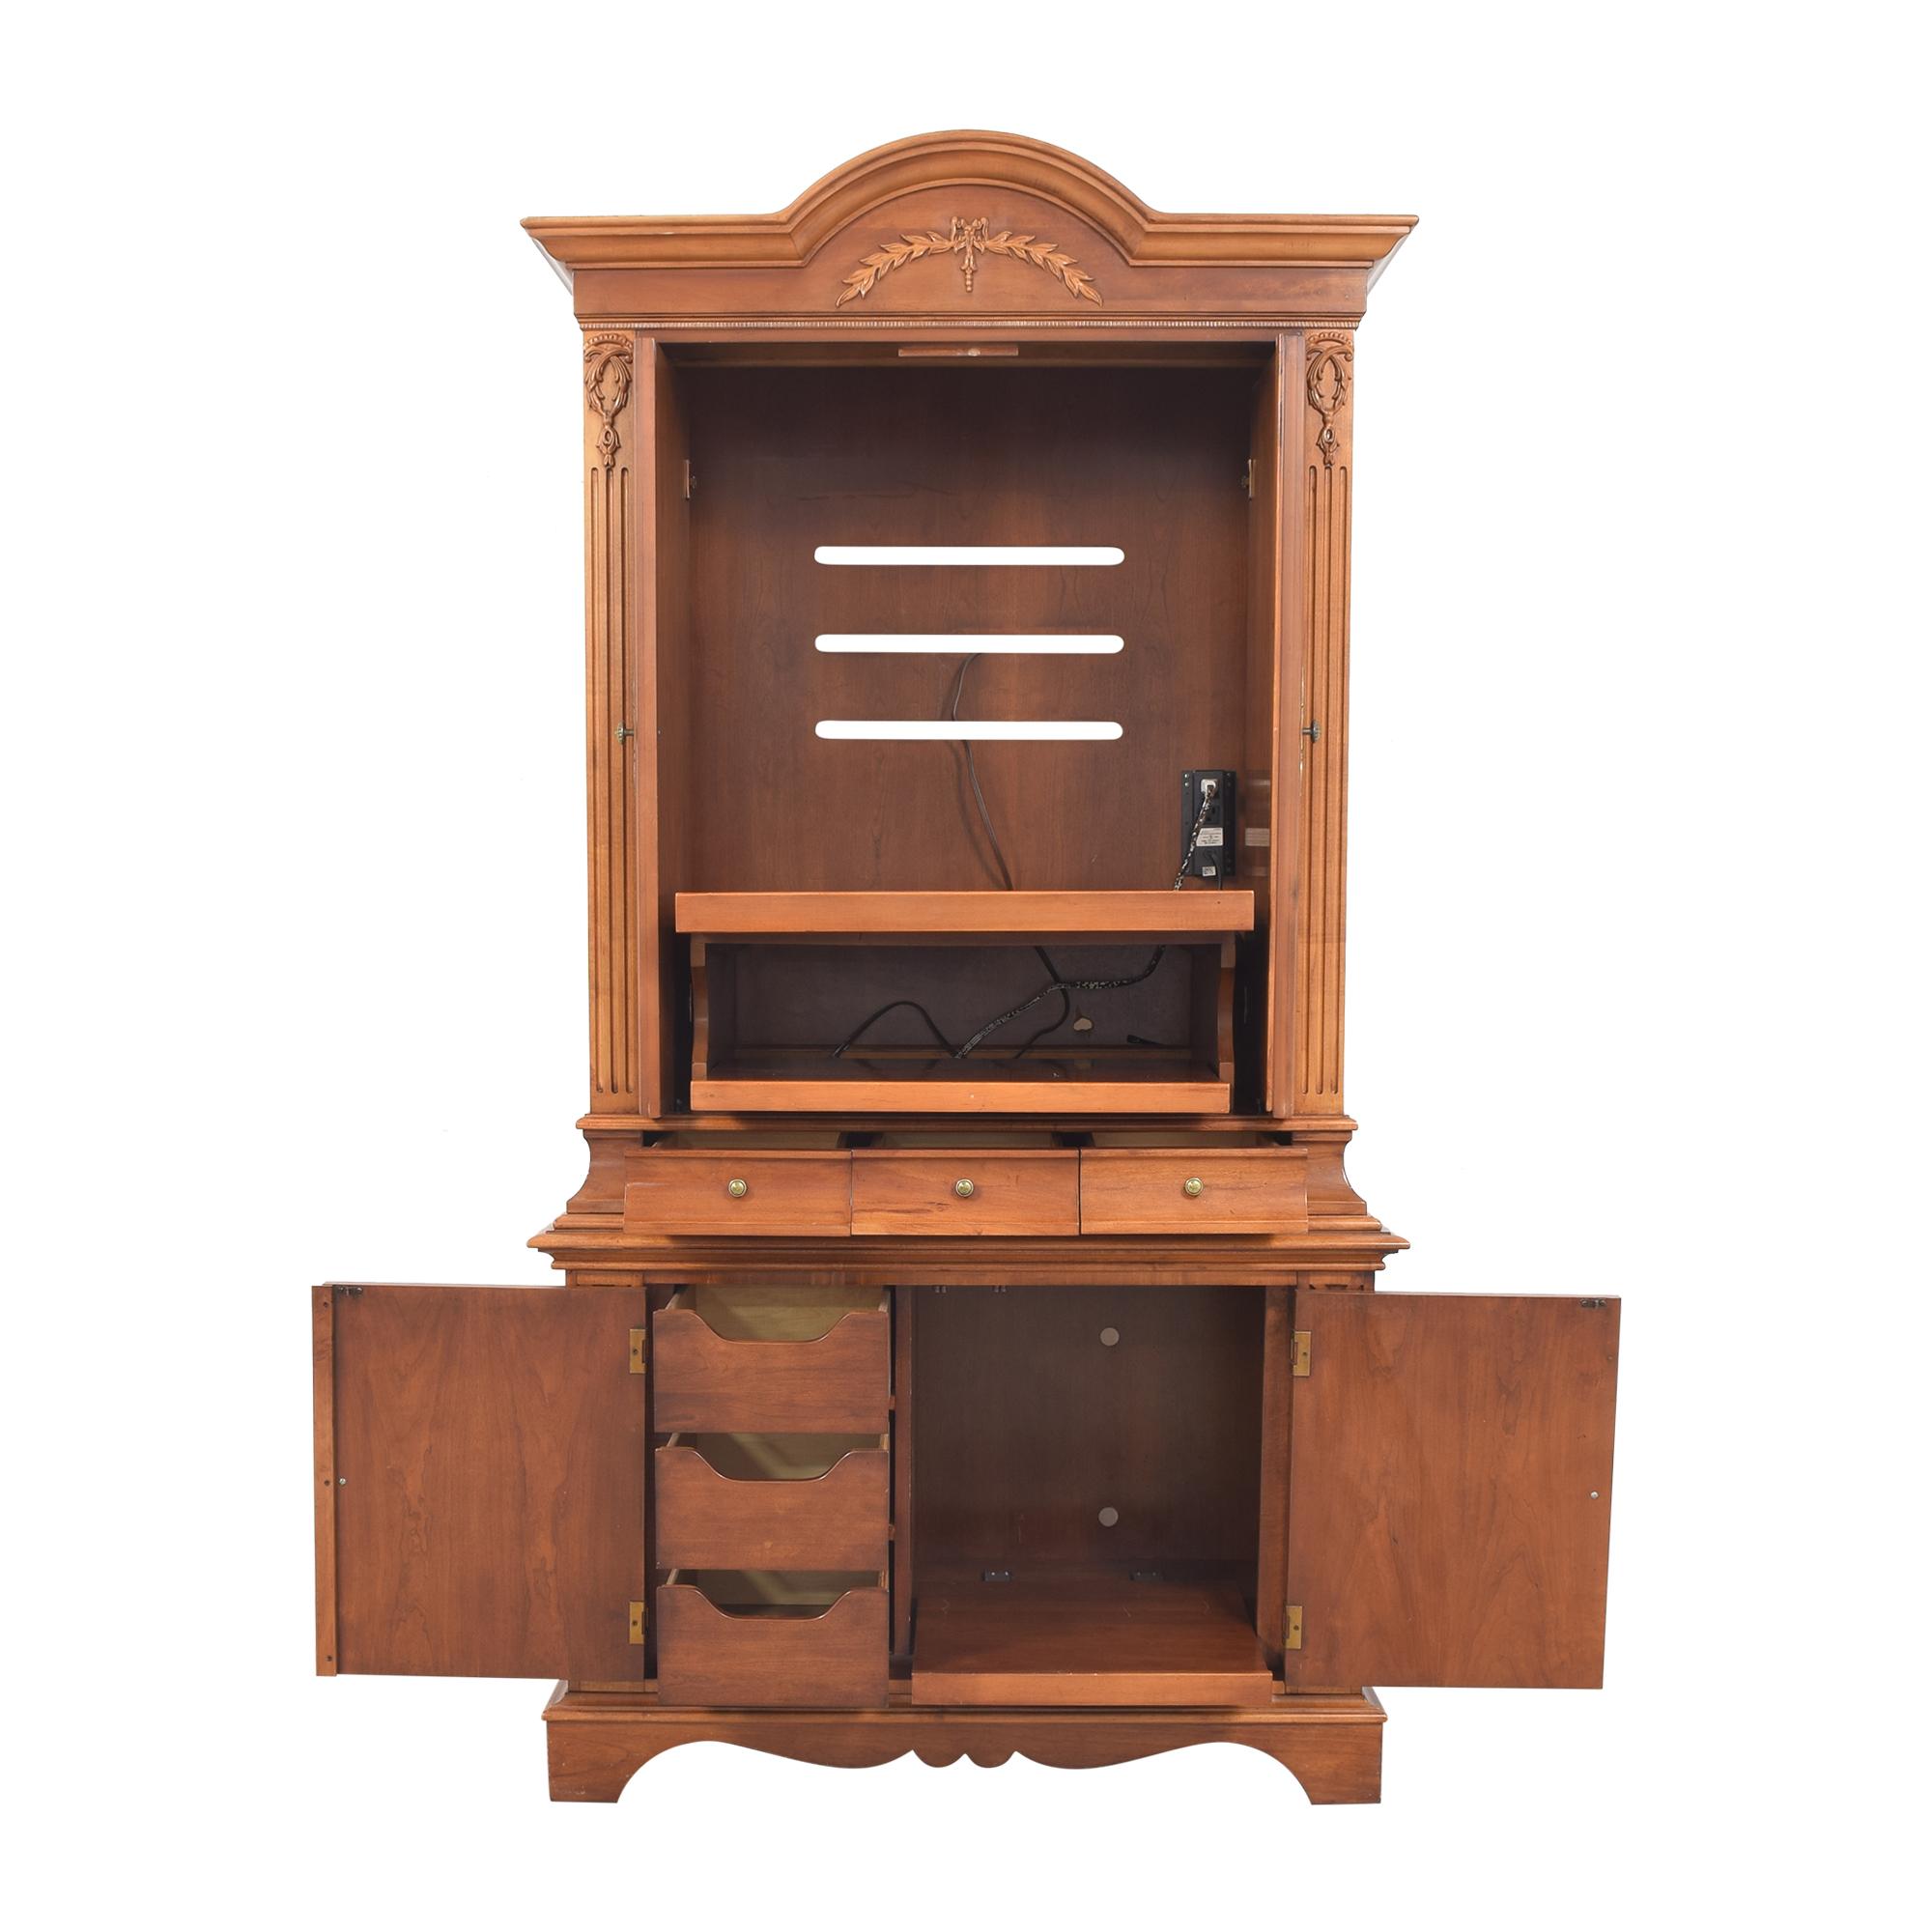 Lexington Furniture Holyn Media Armoire / Storage